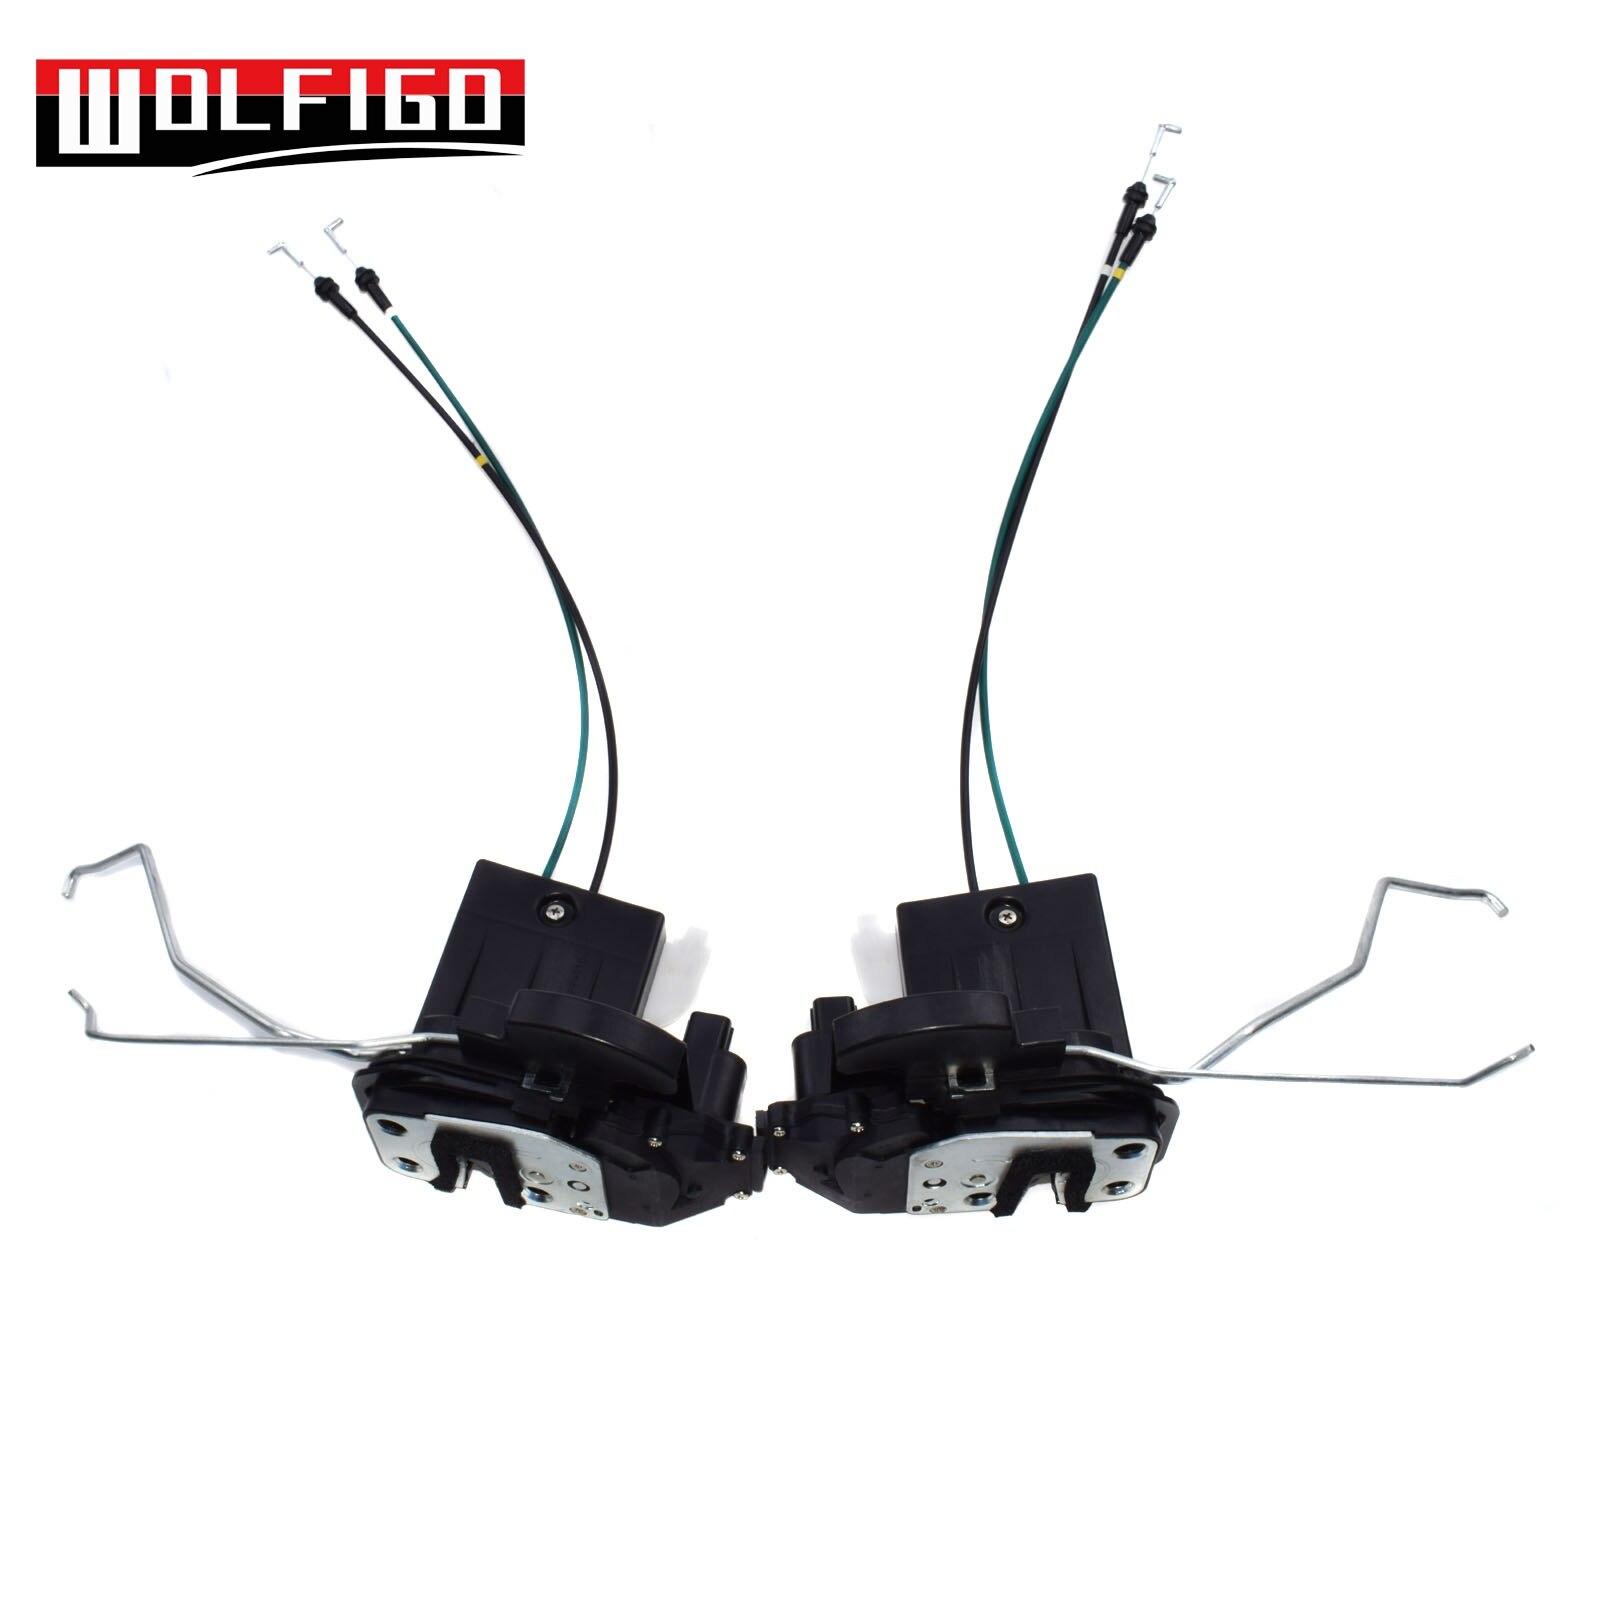 WOLFIGO 1 PC / 2PCS Front Left & Right Door Lock Actuator Motor Latch For Kia Spectra 81310-2F030 New new oem 2pcs front left